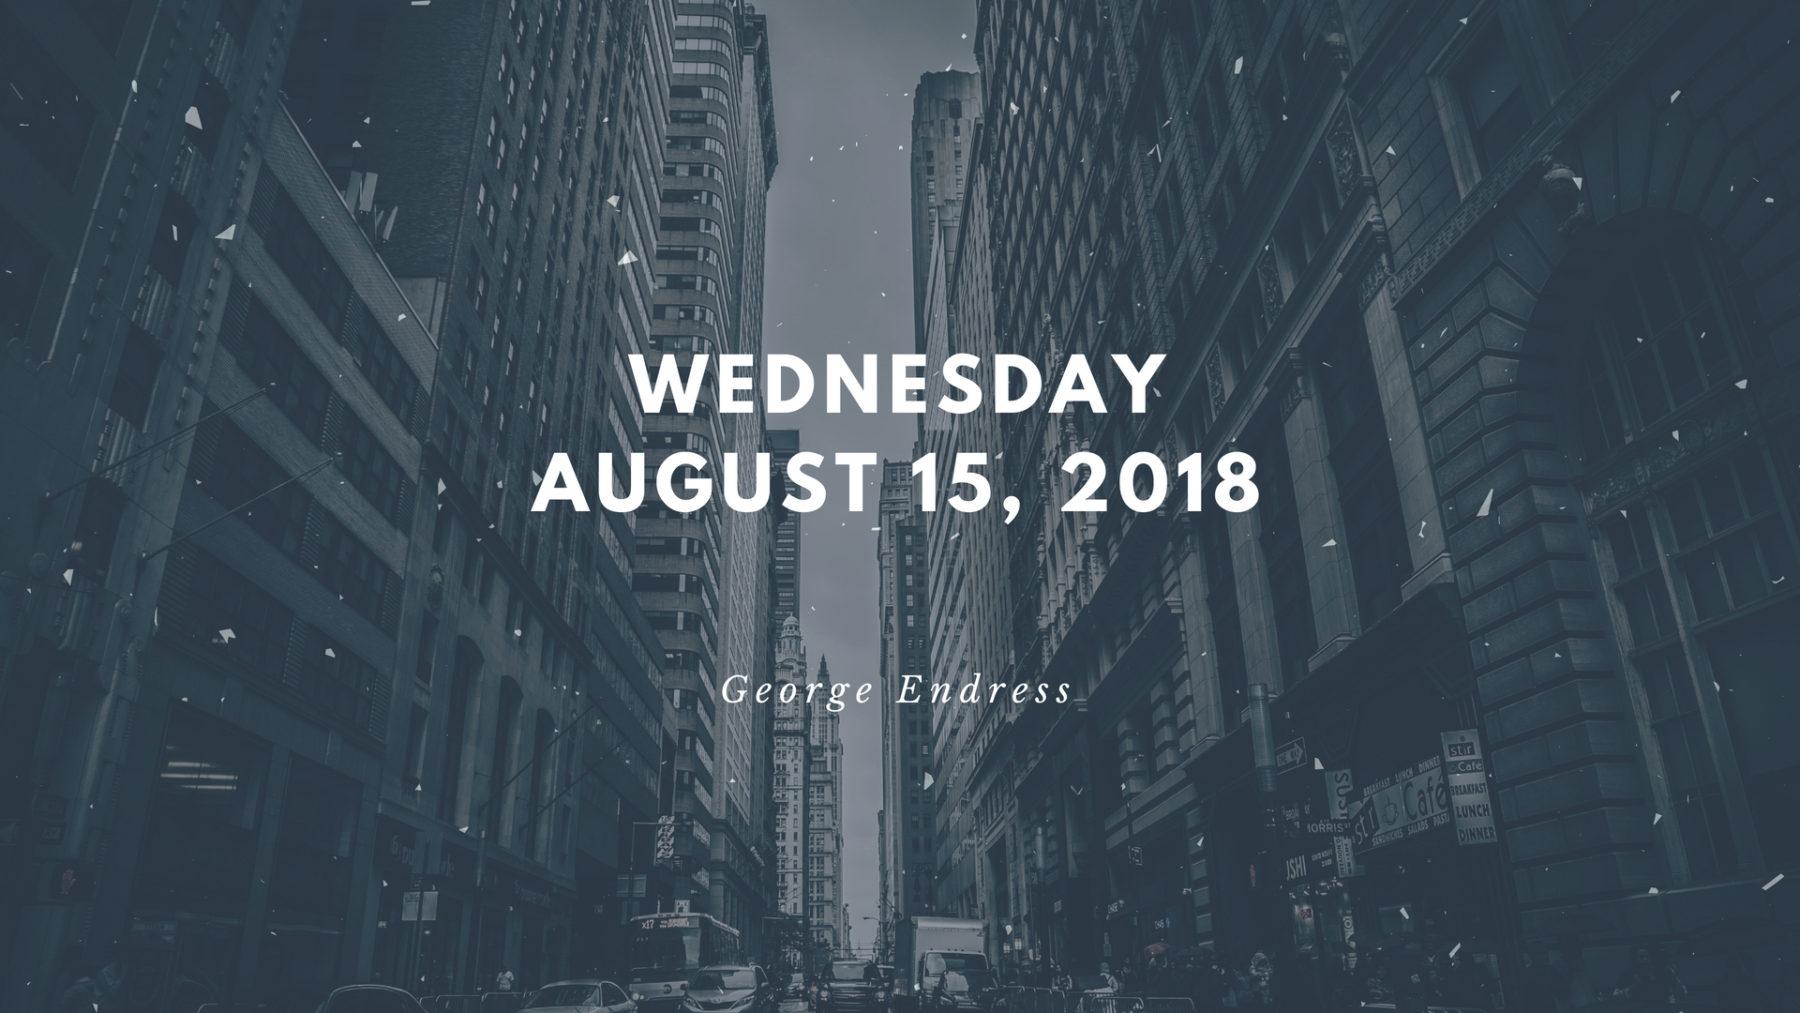 Wednesday, August 15, 2018